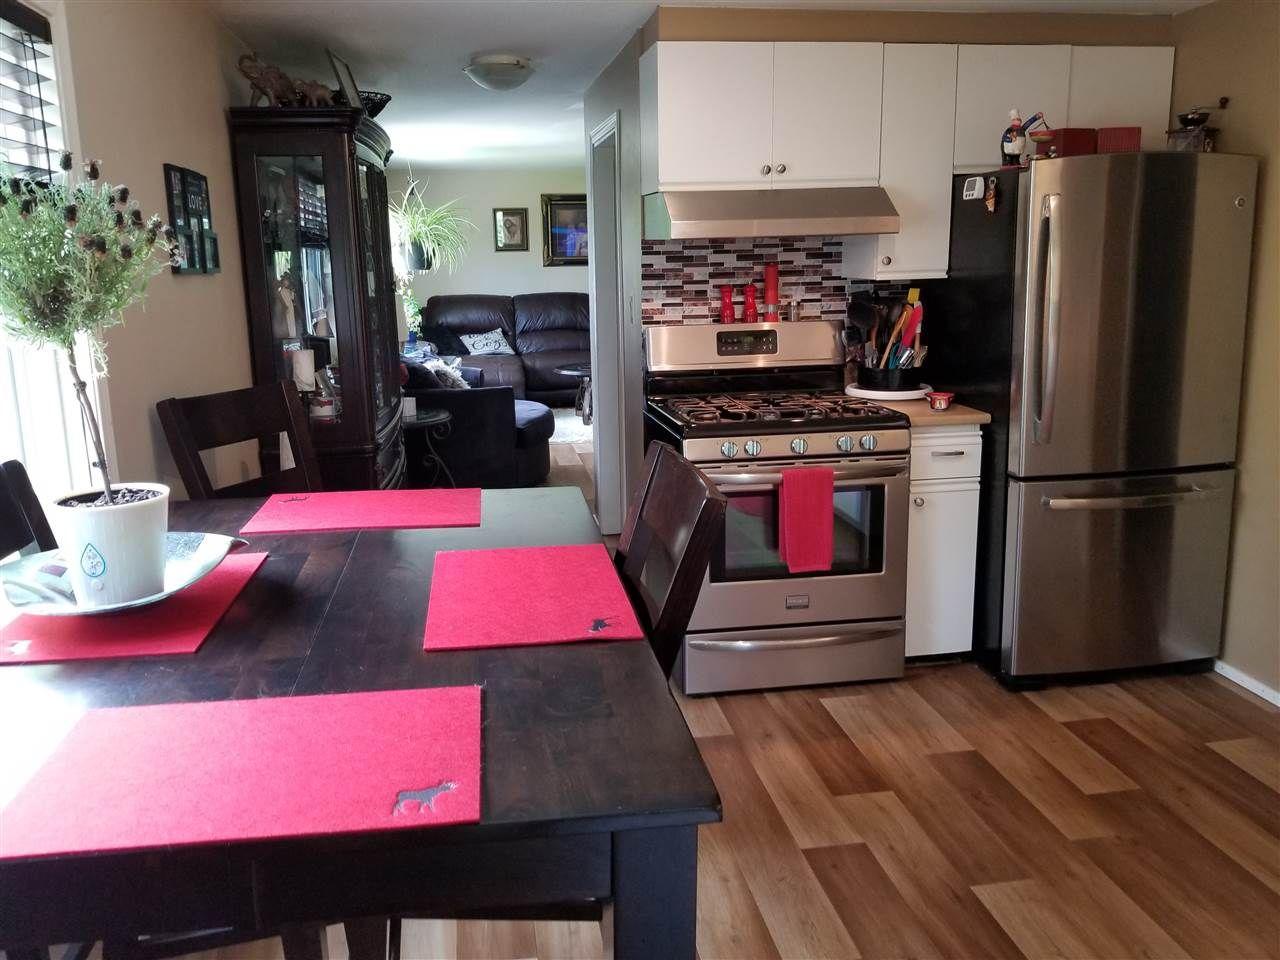 Photo 5: Photos: 1113 DOG CREEK Road in Williams Lake: Esler/Dog Creek House for sale (Williams Lake (Zone 27))  : MLS®# R2472139